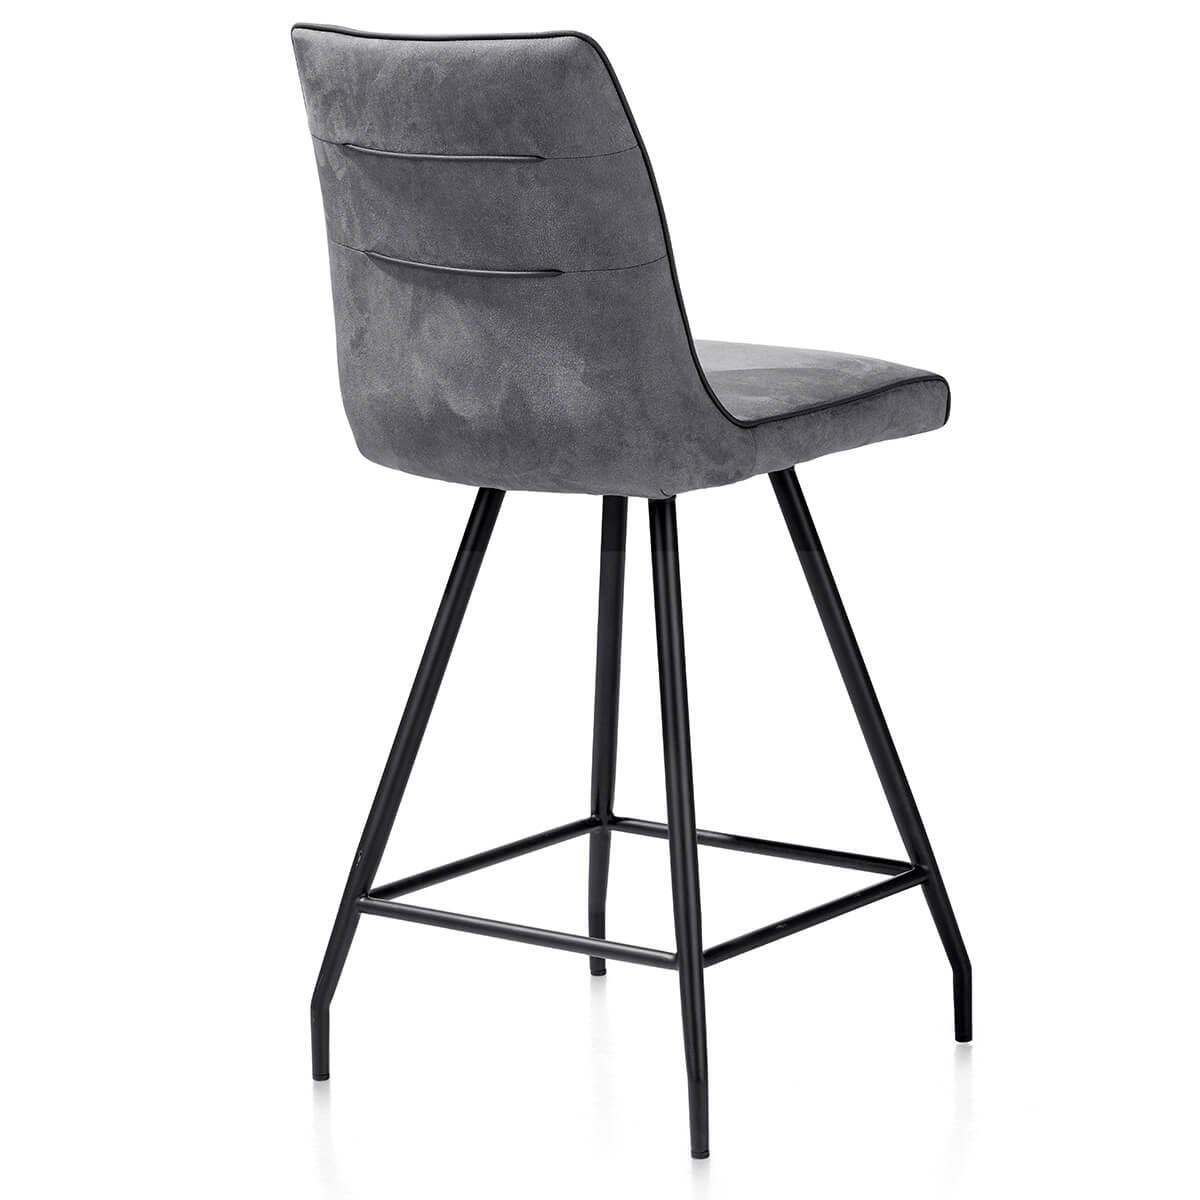 Chaise de bar MAXIM by Henders & Hazel  gris anthracite